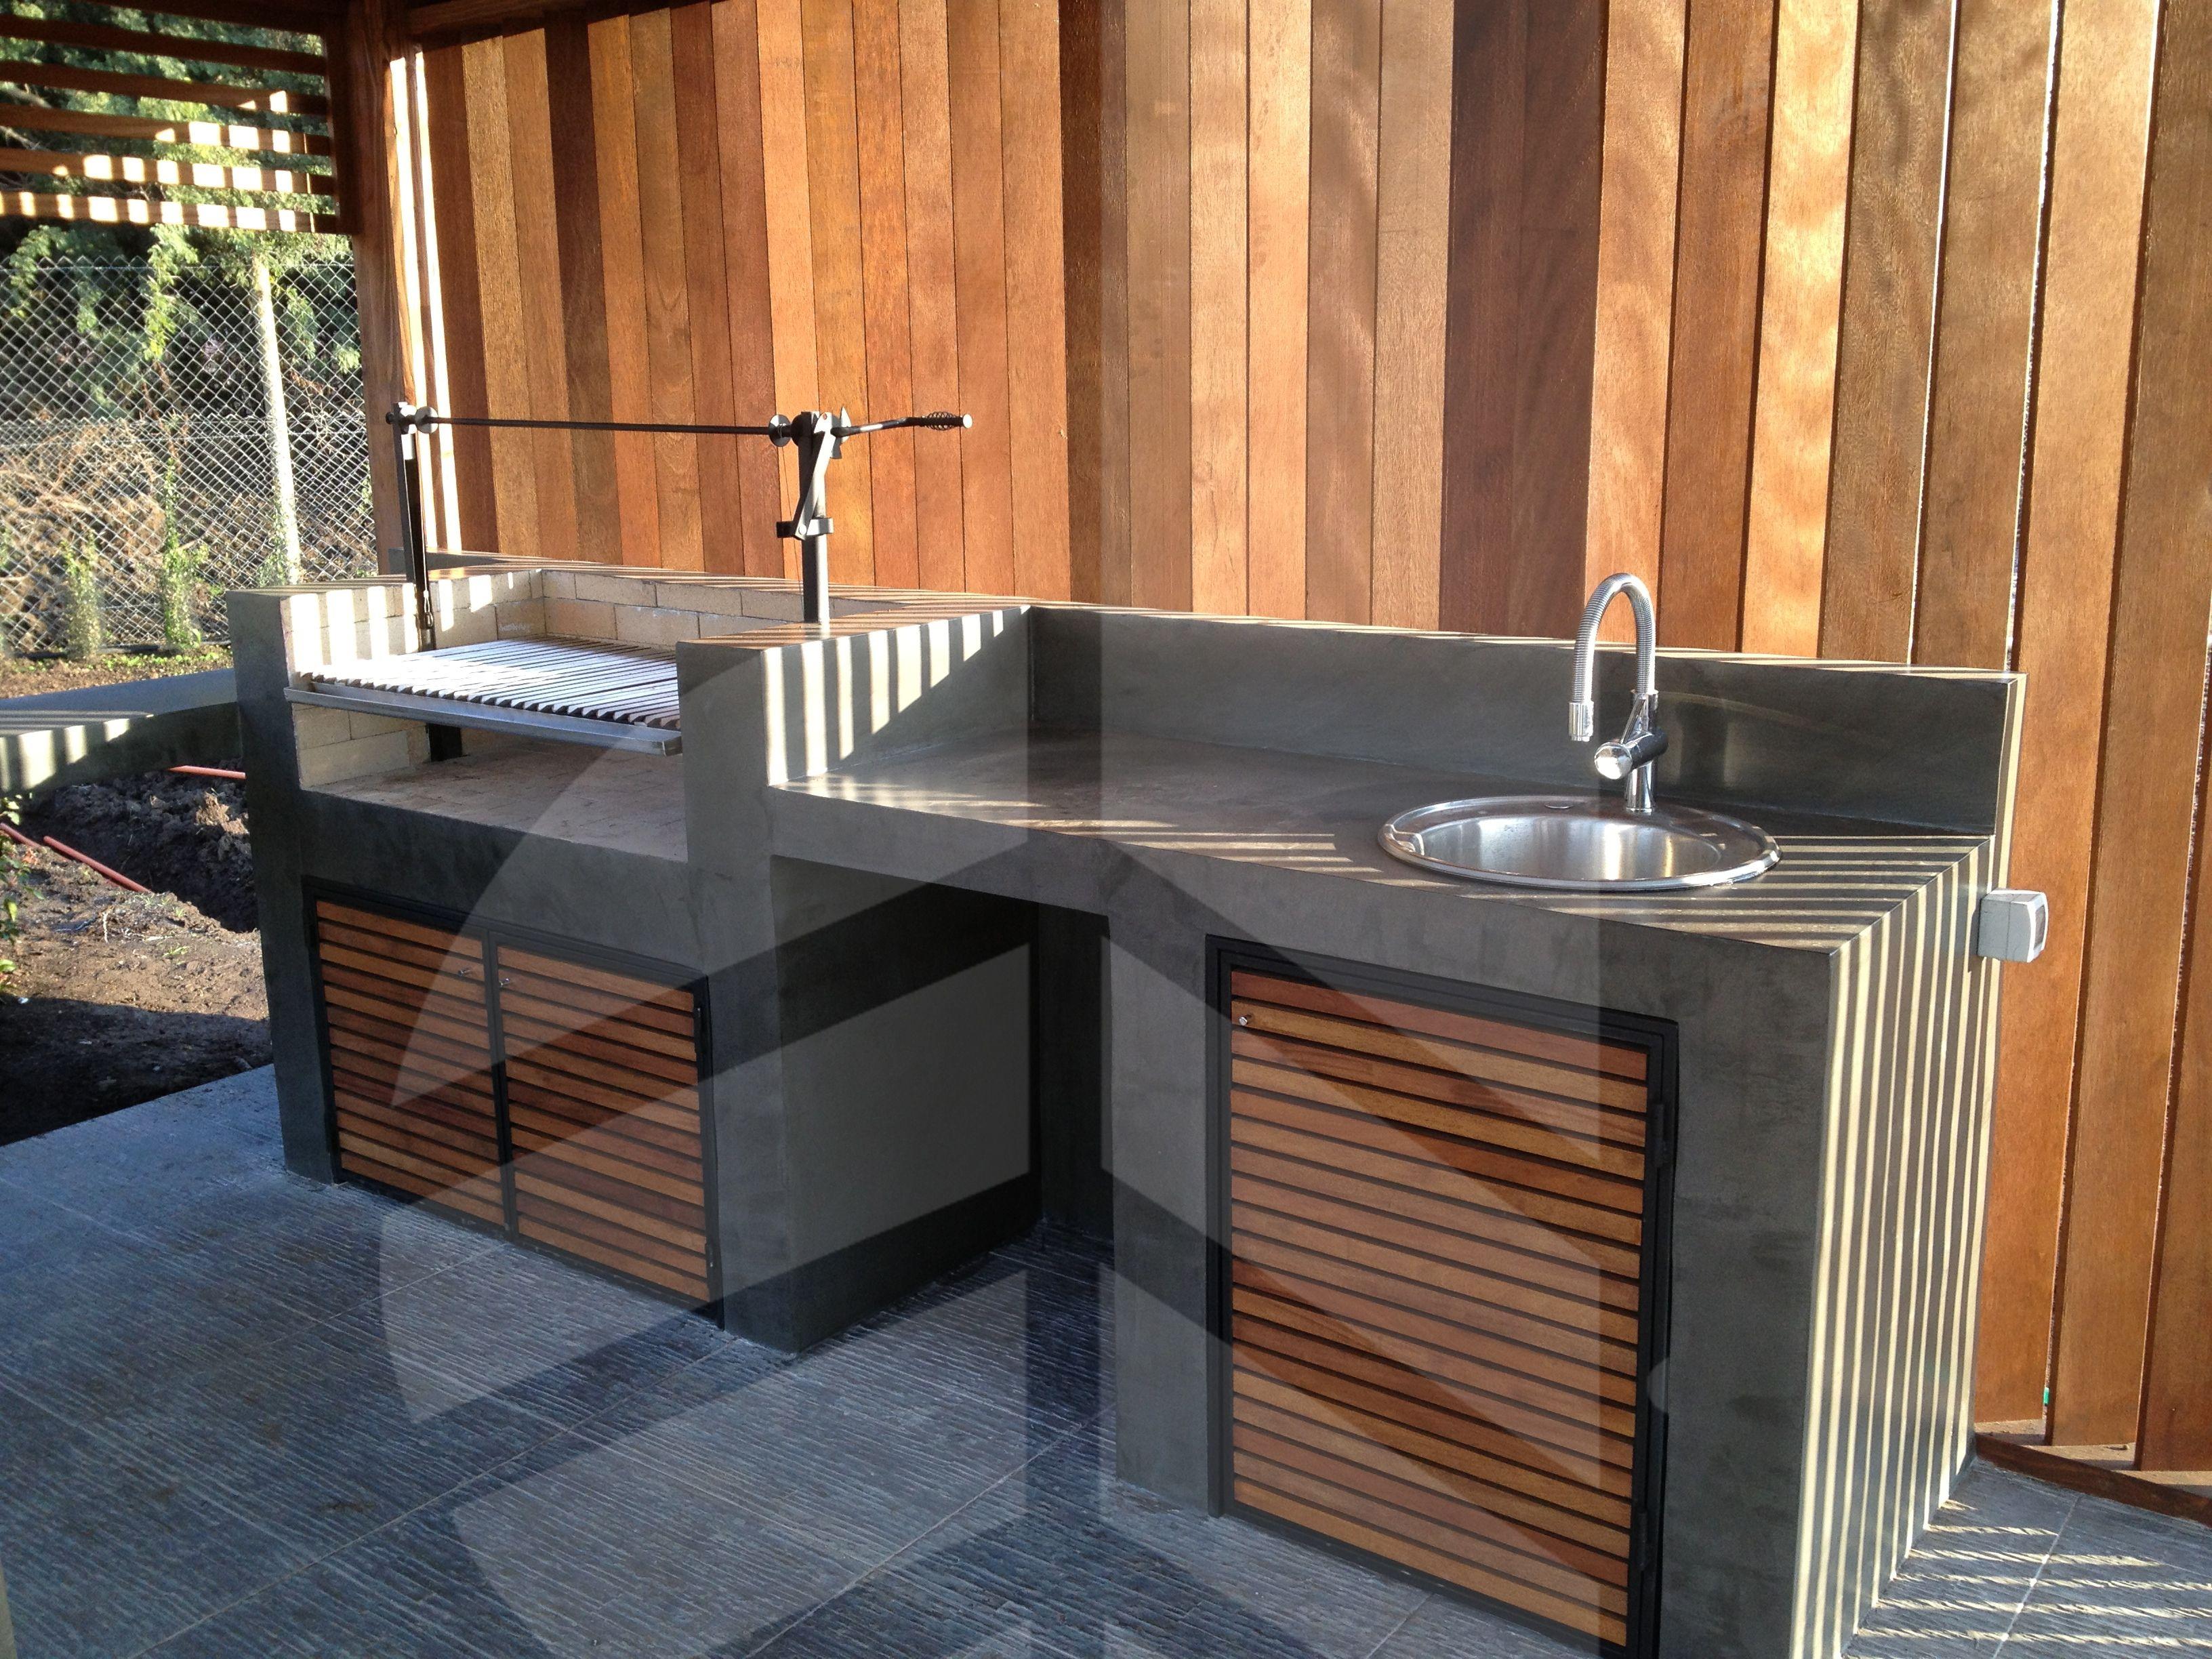 detalle de quincho en terraza con cortavista ni os y casa pinterest outdoor k che garten. Black Bedroom Furniture Sets. Home Design Ideas